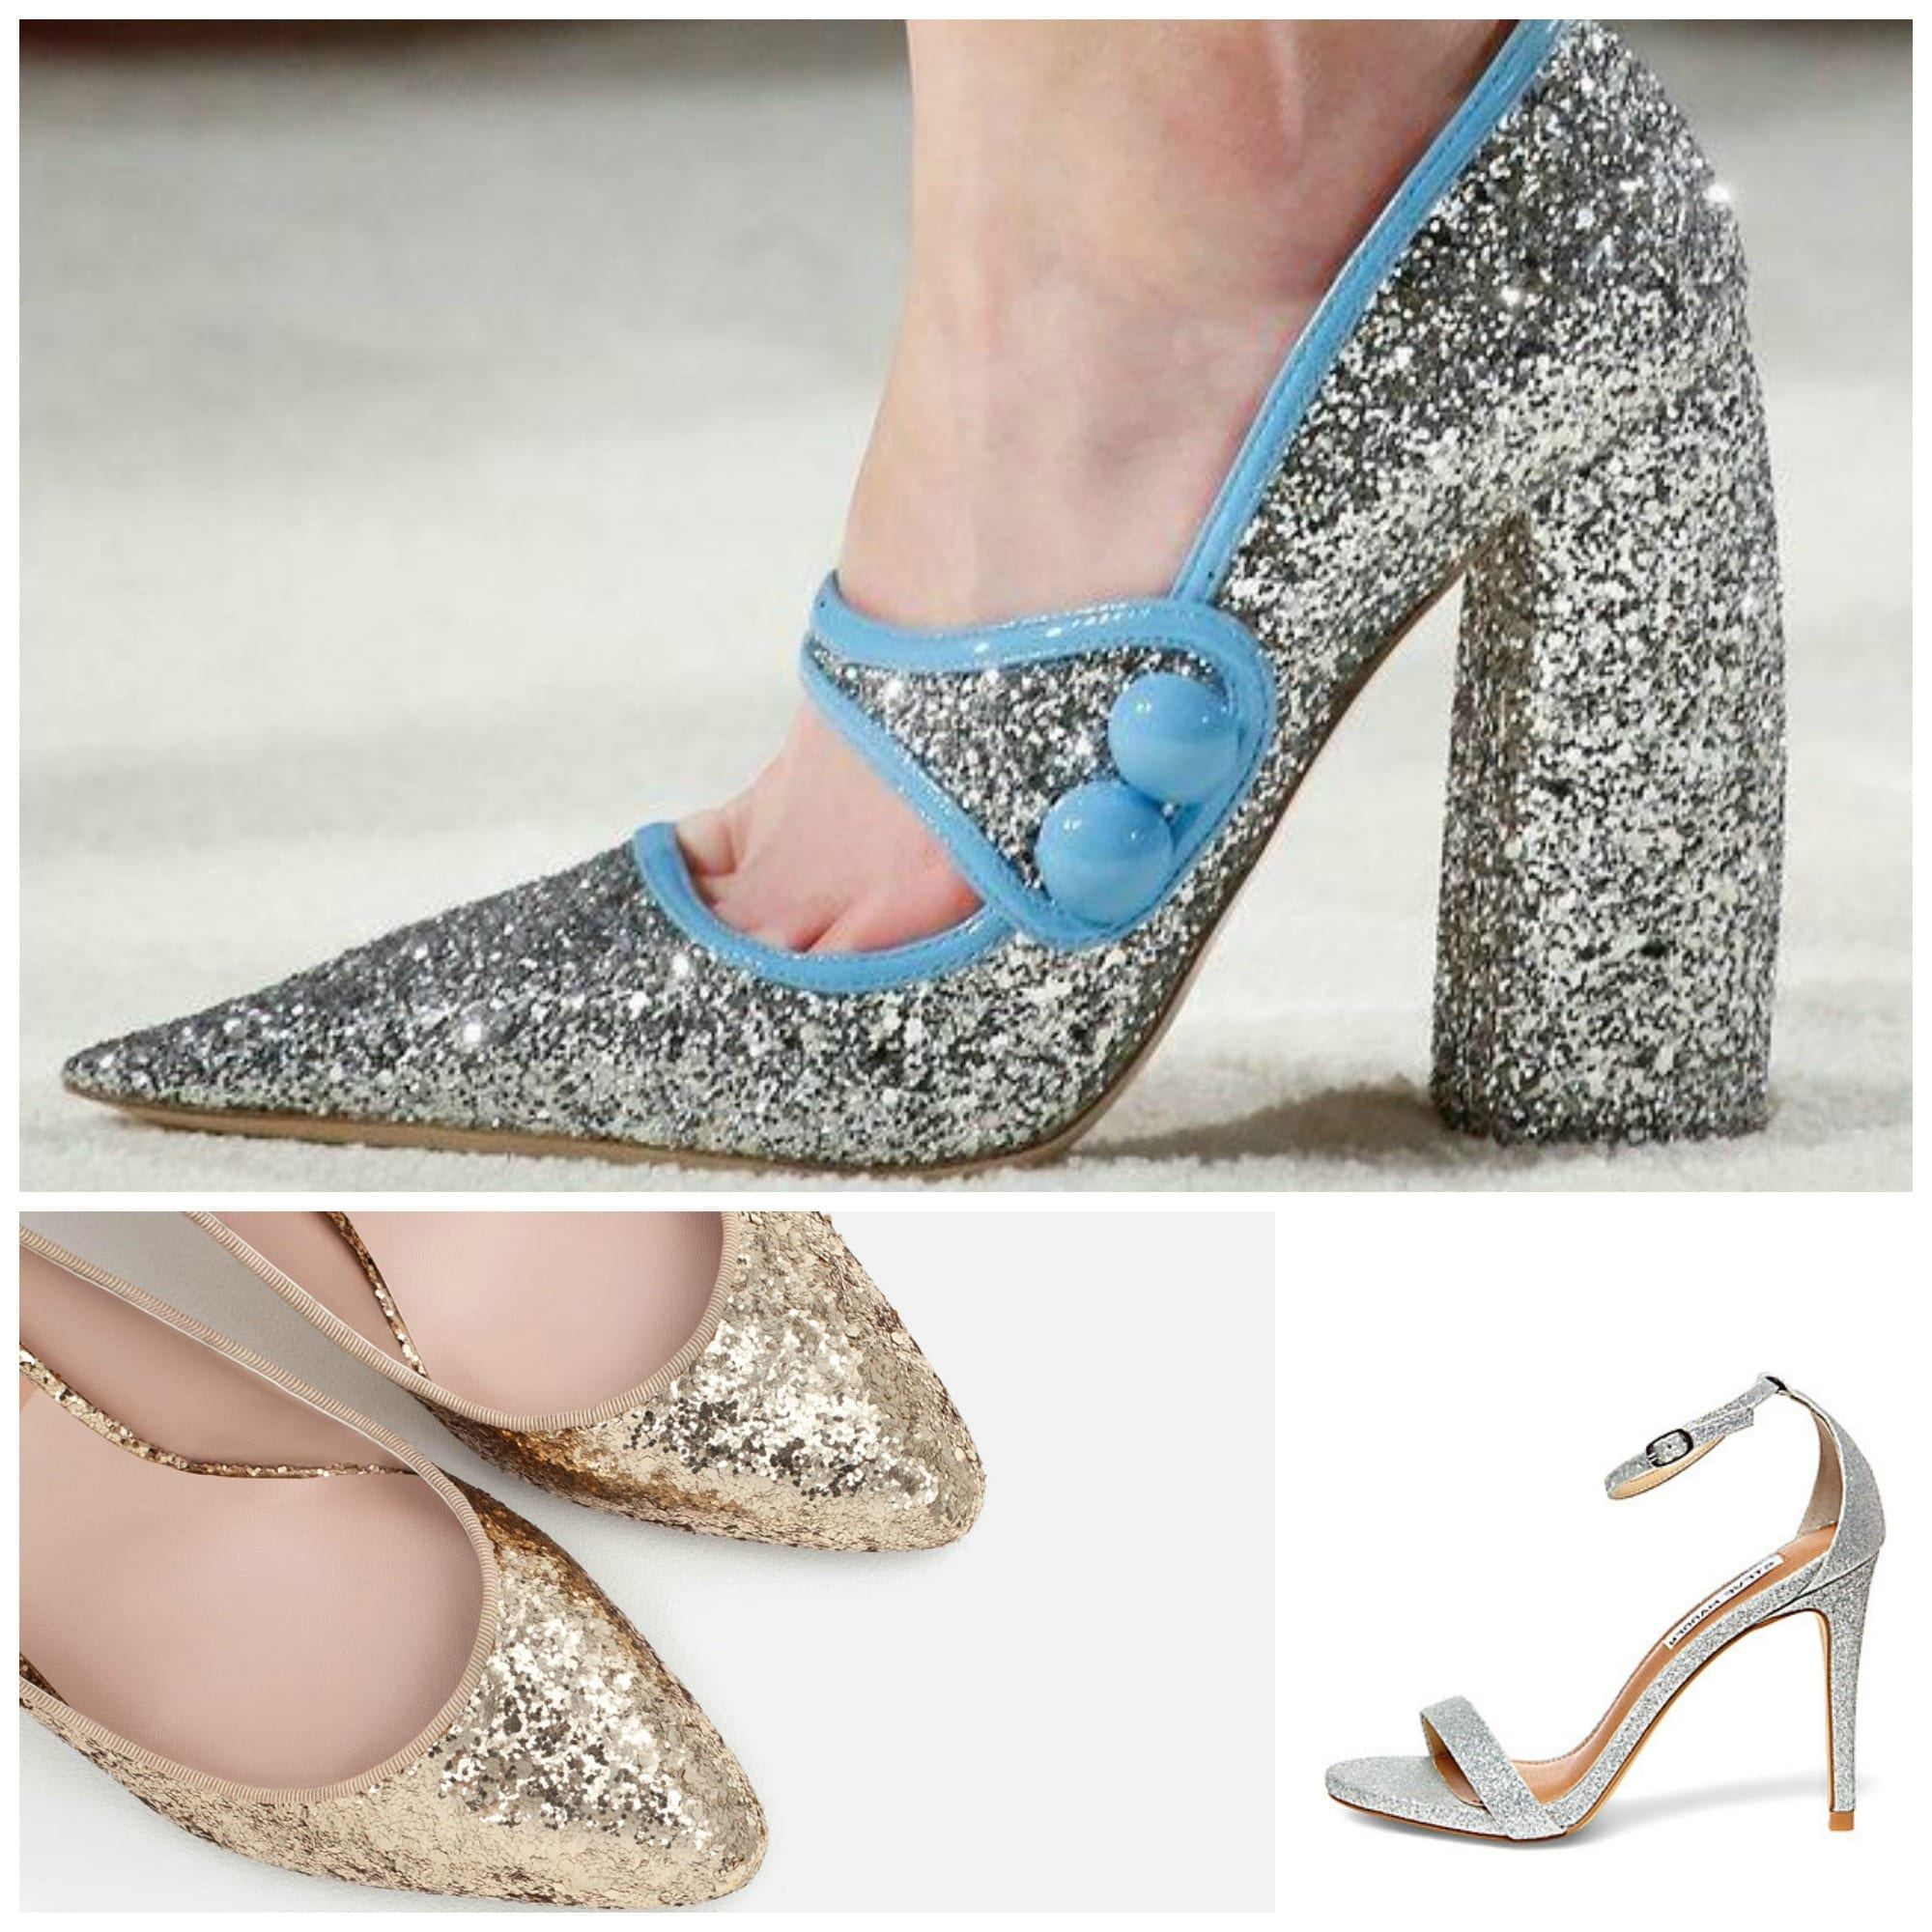 che scarpe vanno di moda, sophia webster shoes, rockstud valentino, glitter scarpe, theladycracy.it, elisa bellino, miu miu glitter shoes, jimmy choo heels